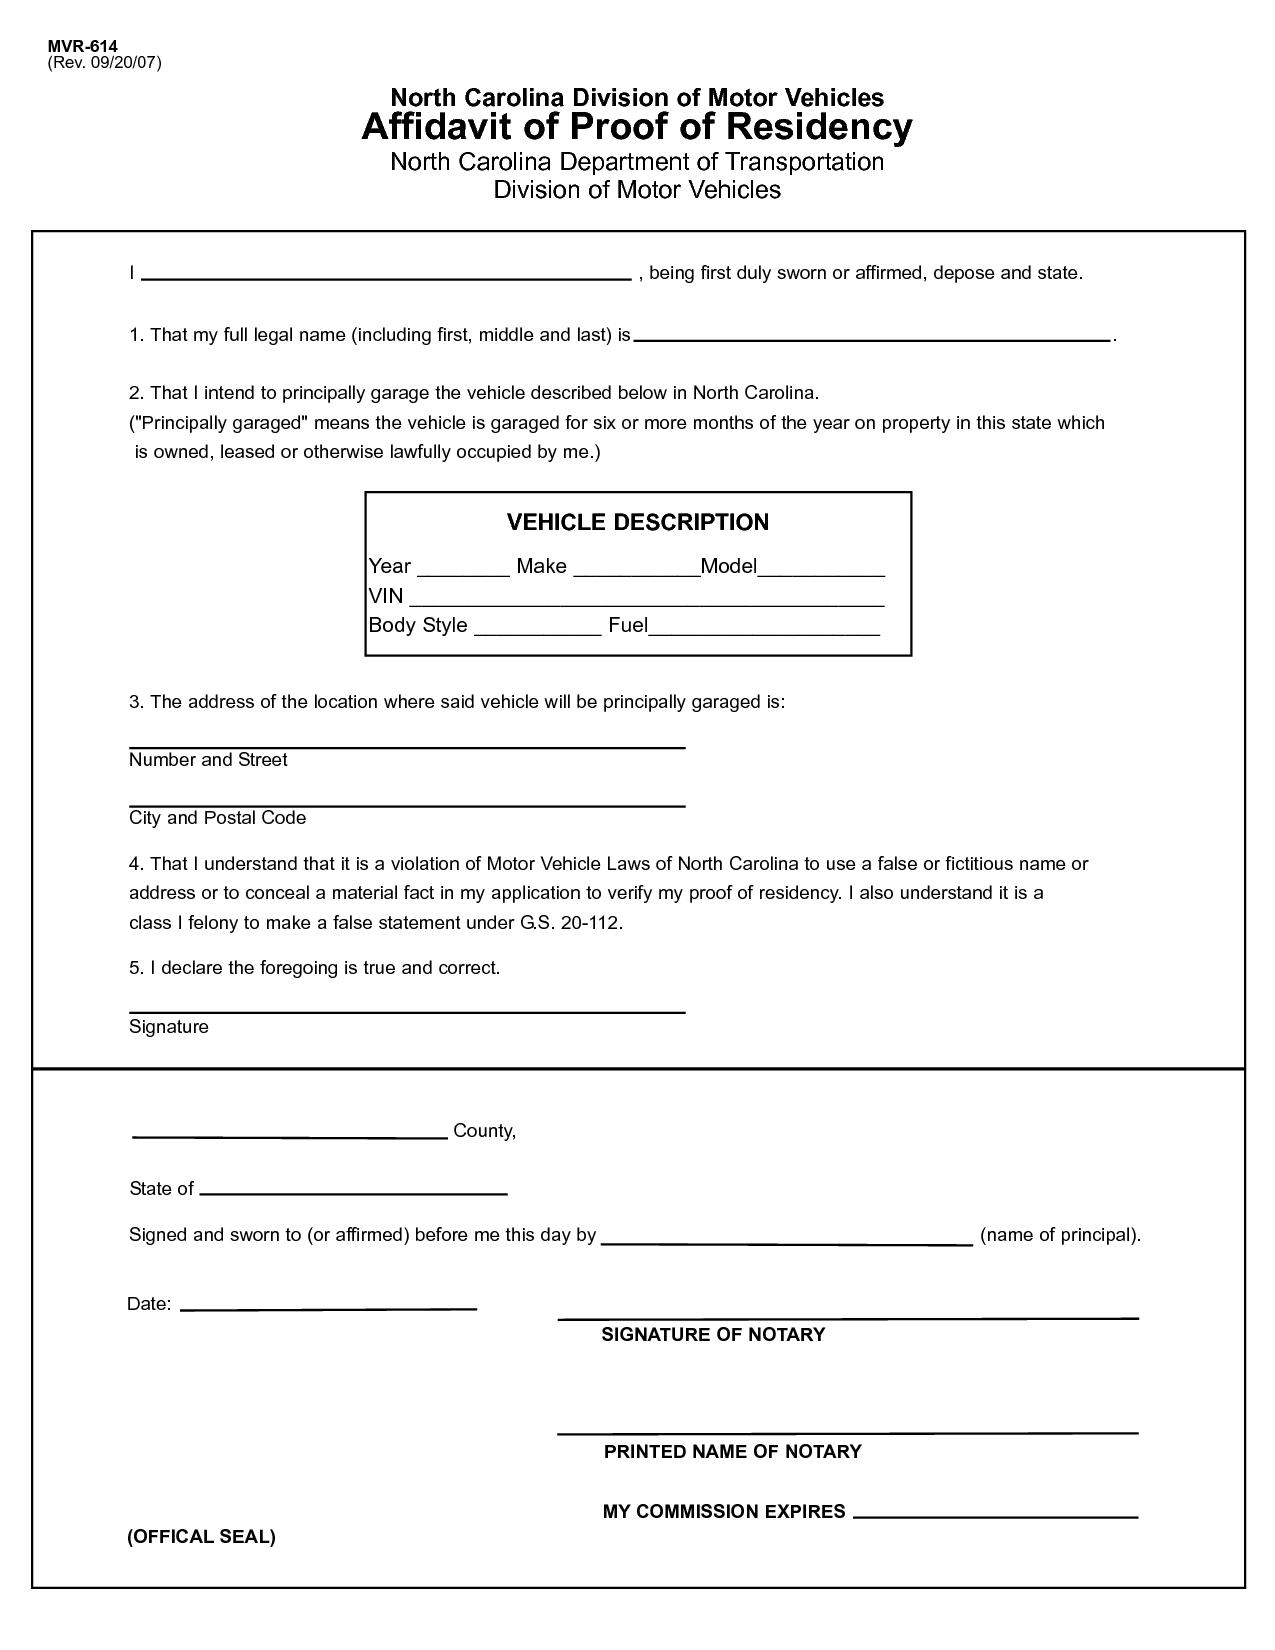 Affidavit Certificate of Residency ILLONIS